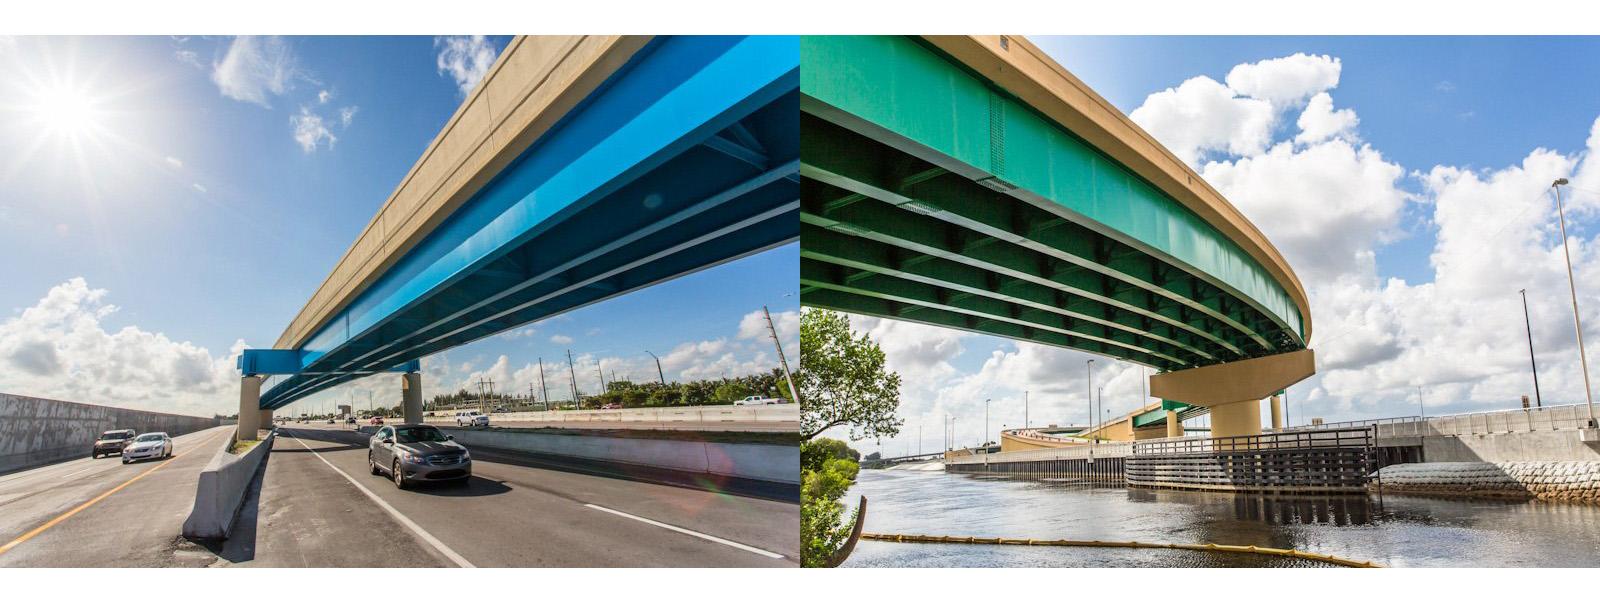 before-after-bridge-design